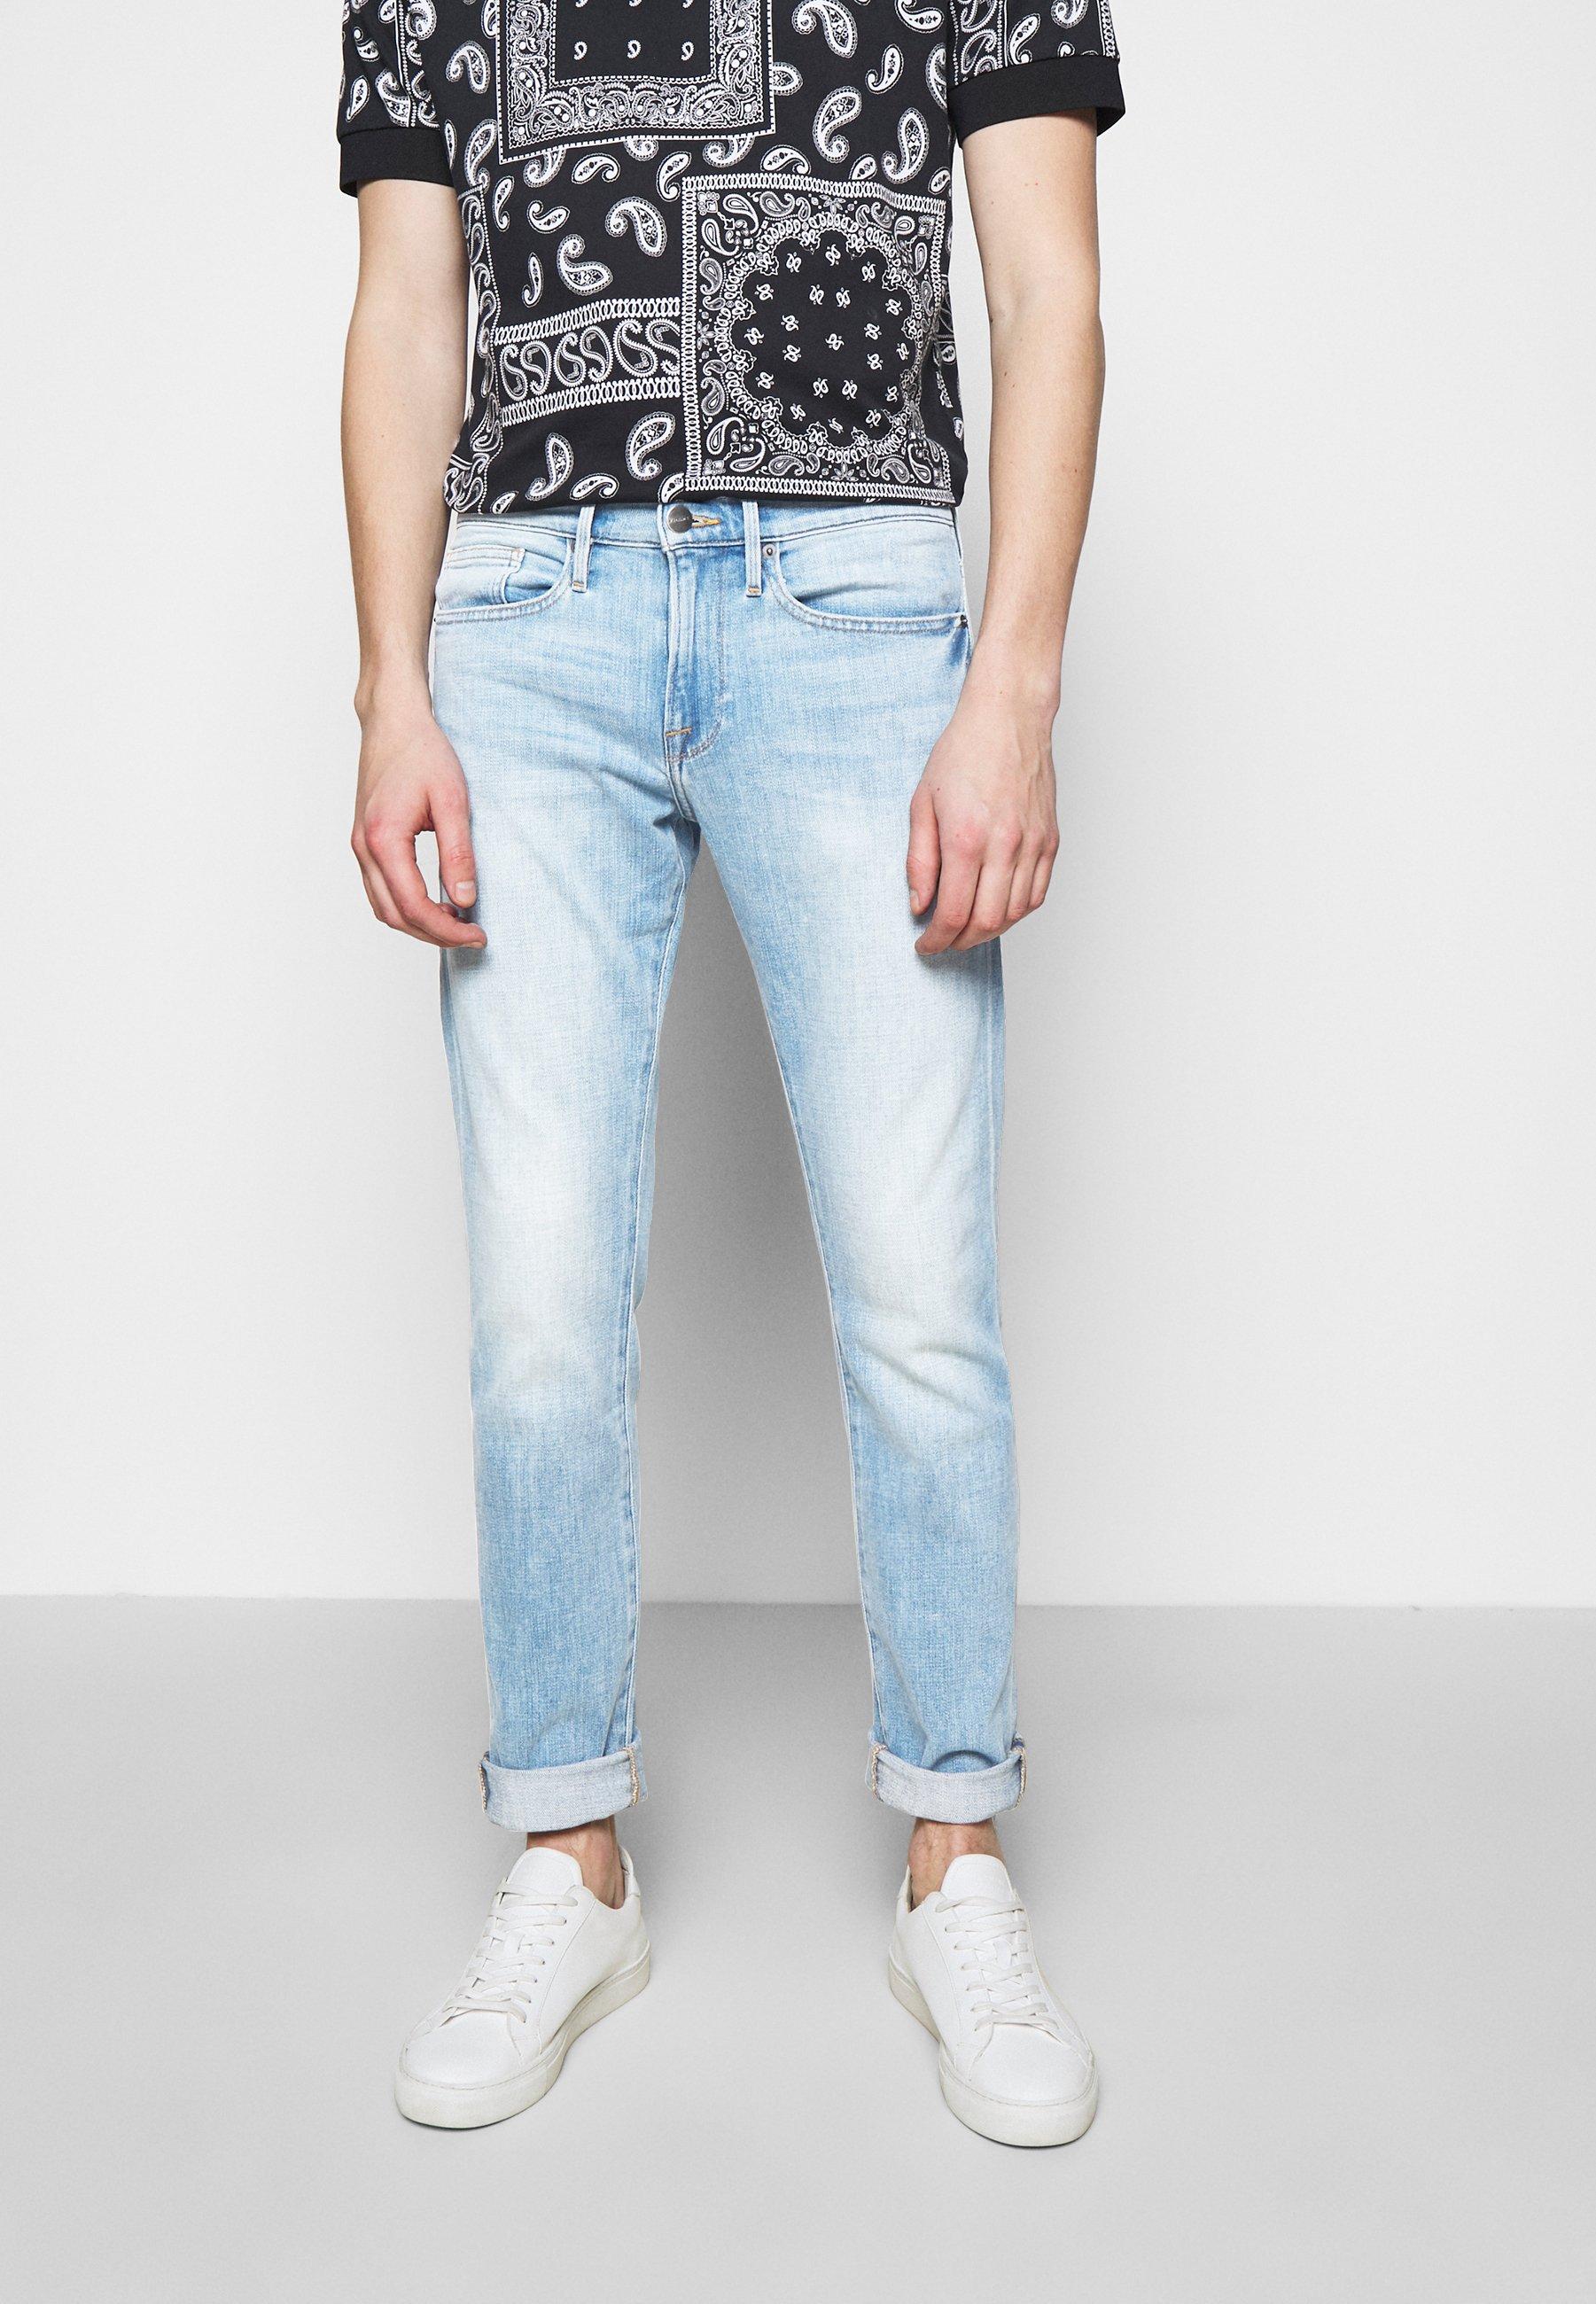 Uomo HOMME - Jeans slim fit